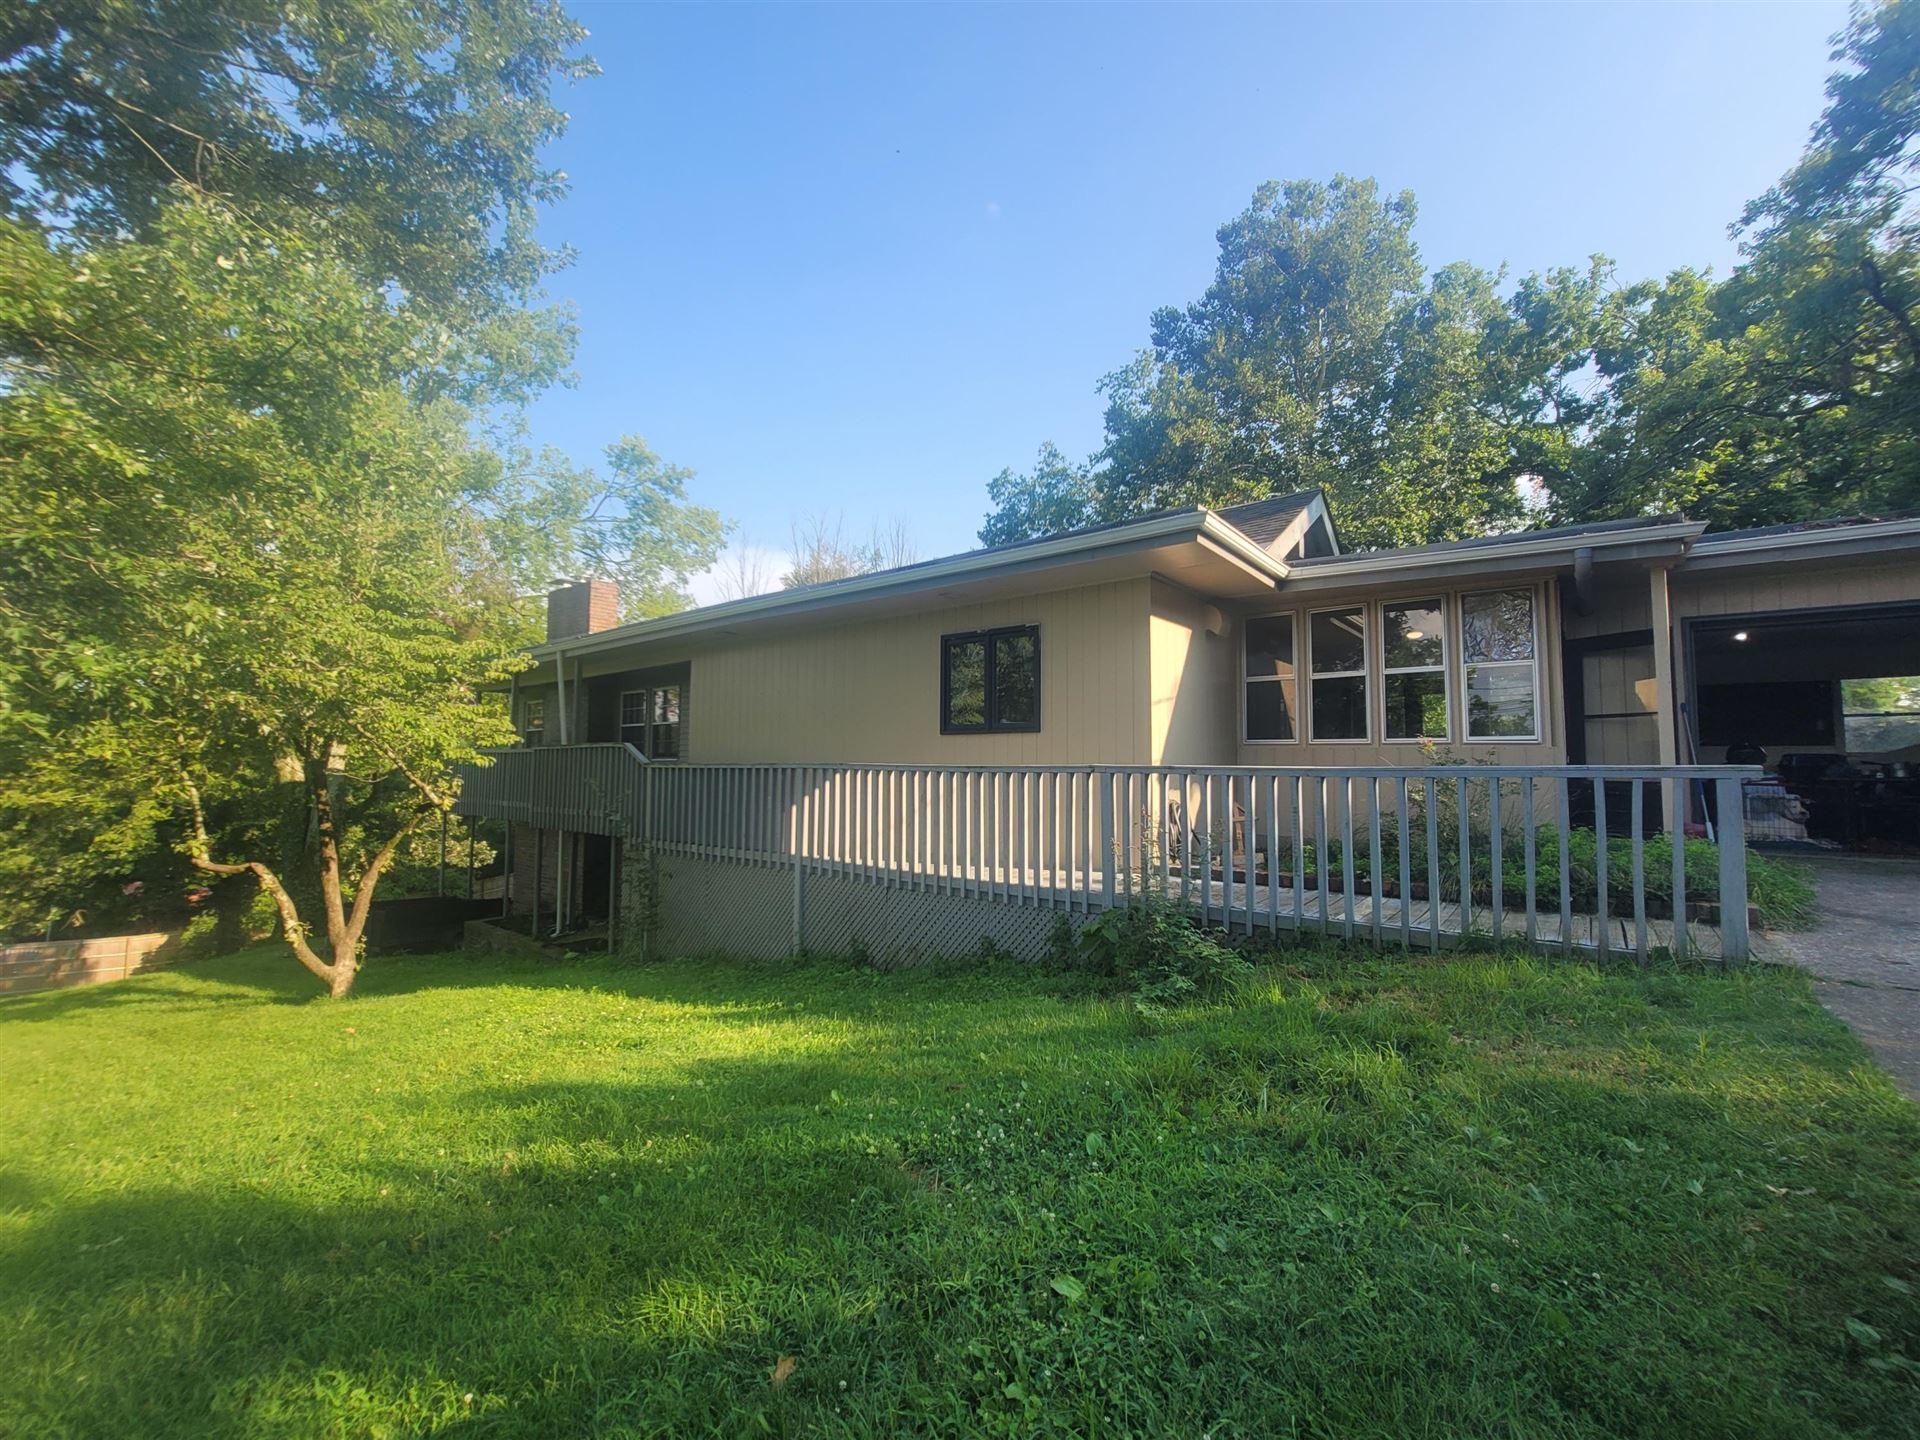 115 Armitage, Richmond, KY 40475 - MLS#: 20114674